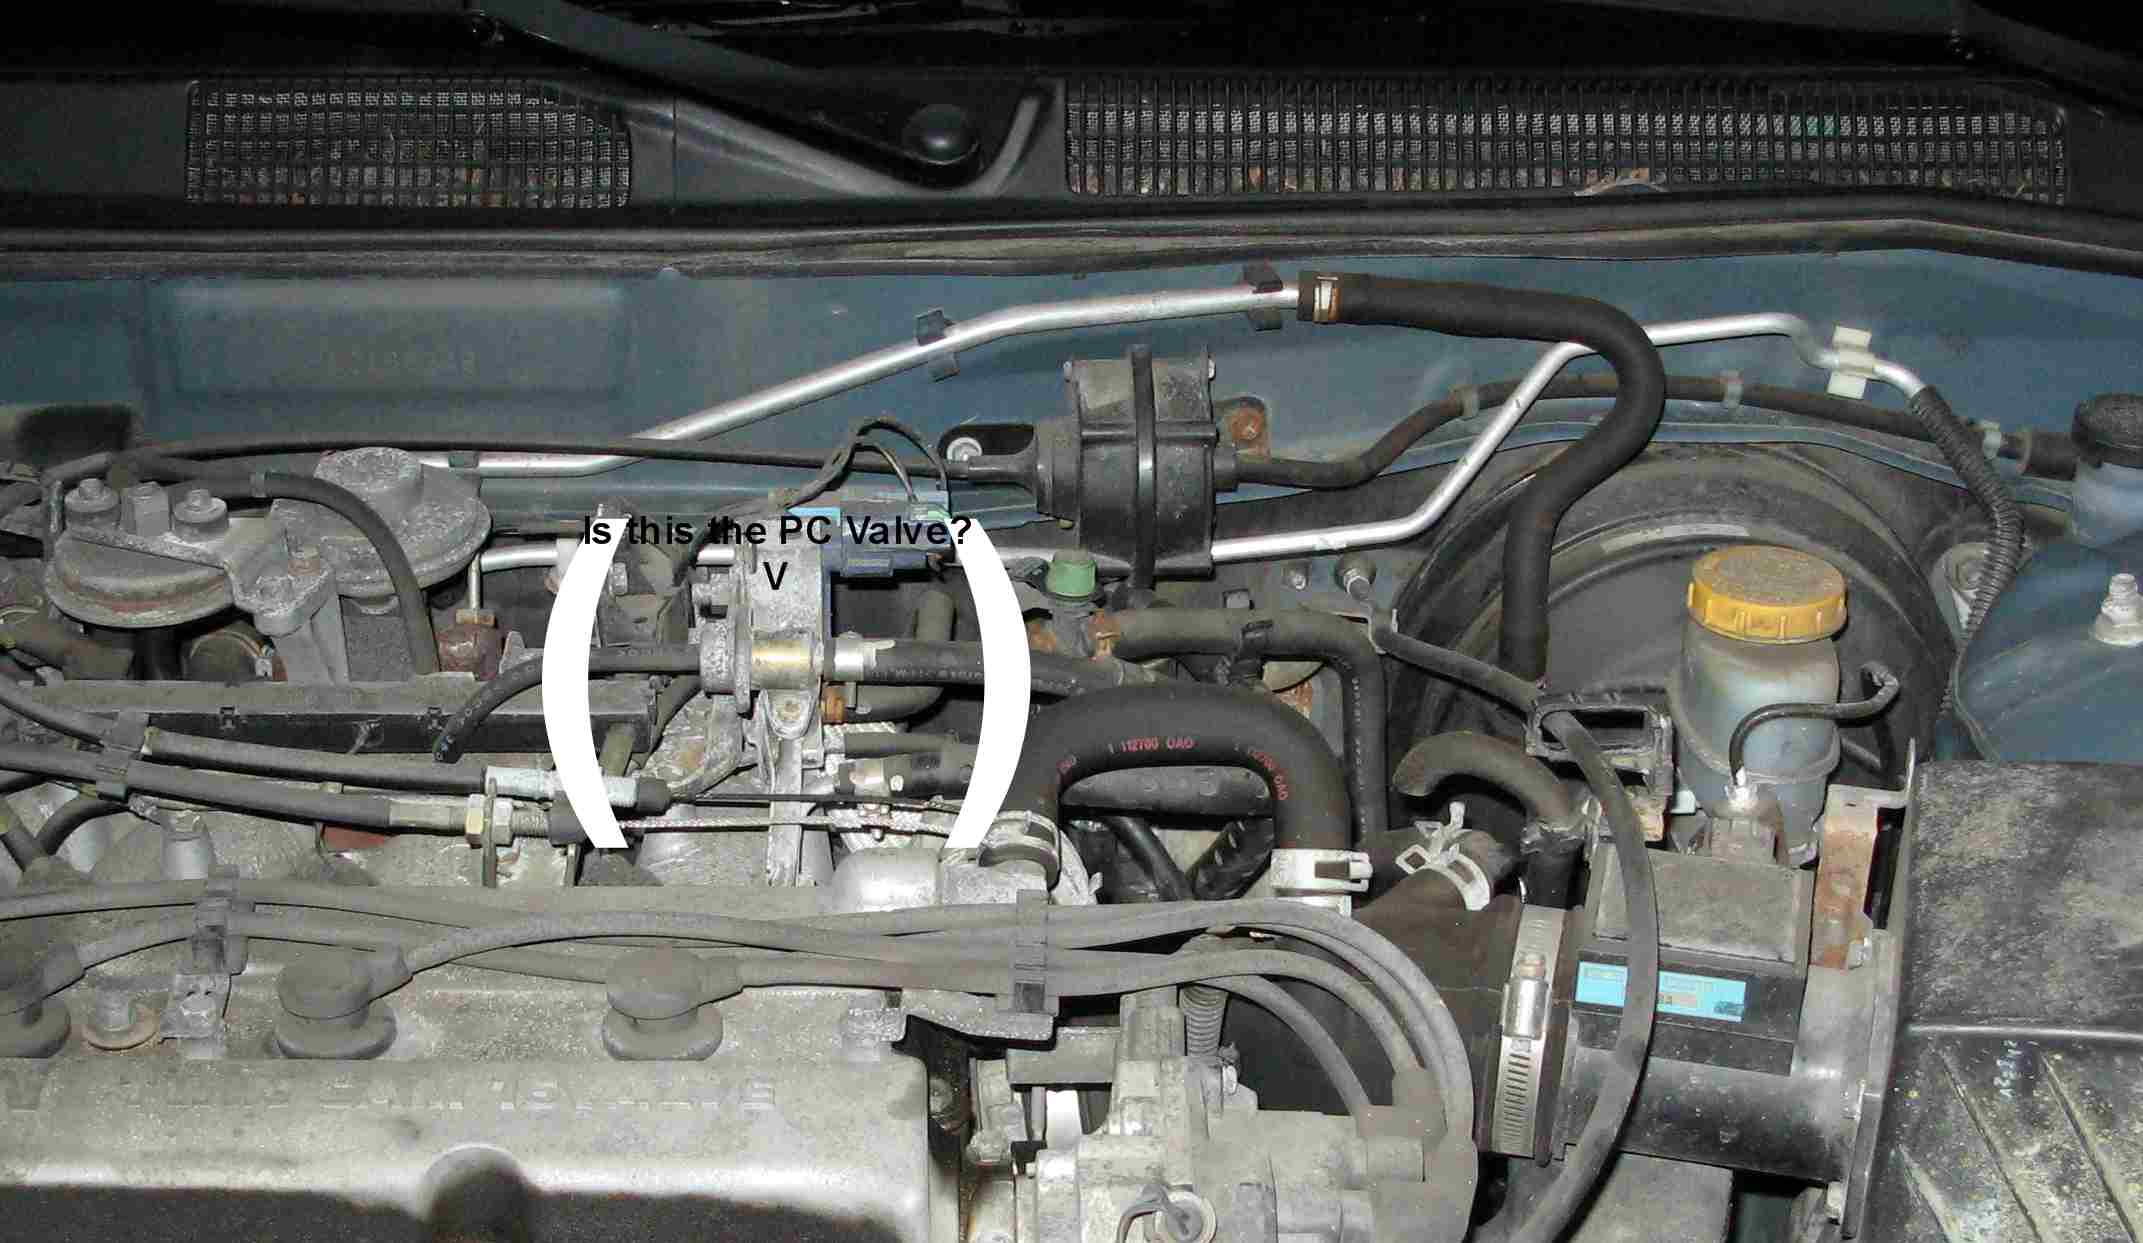 PCV valve location